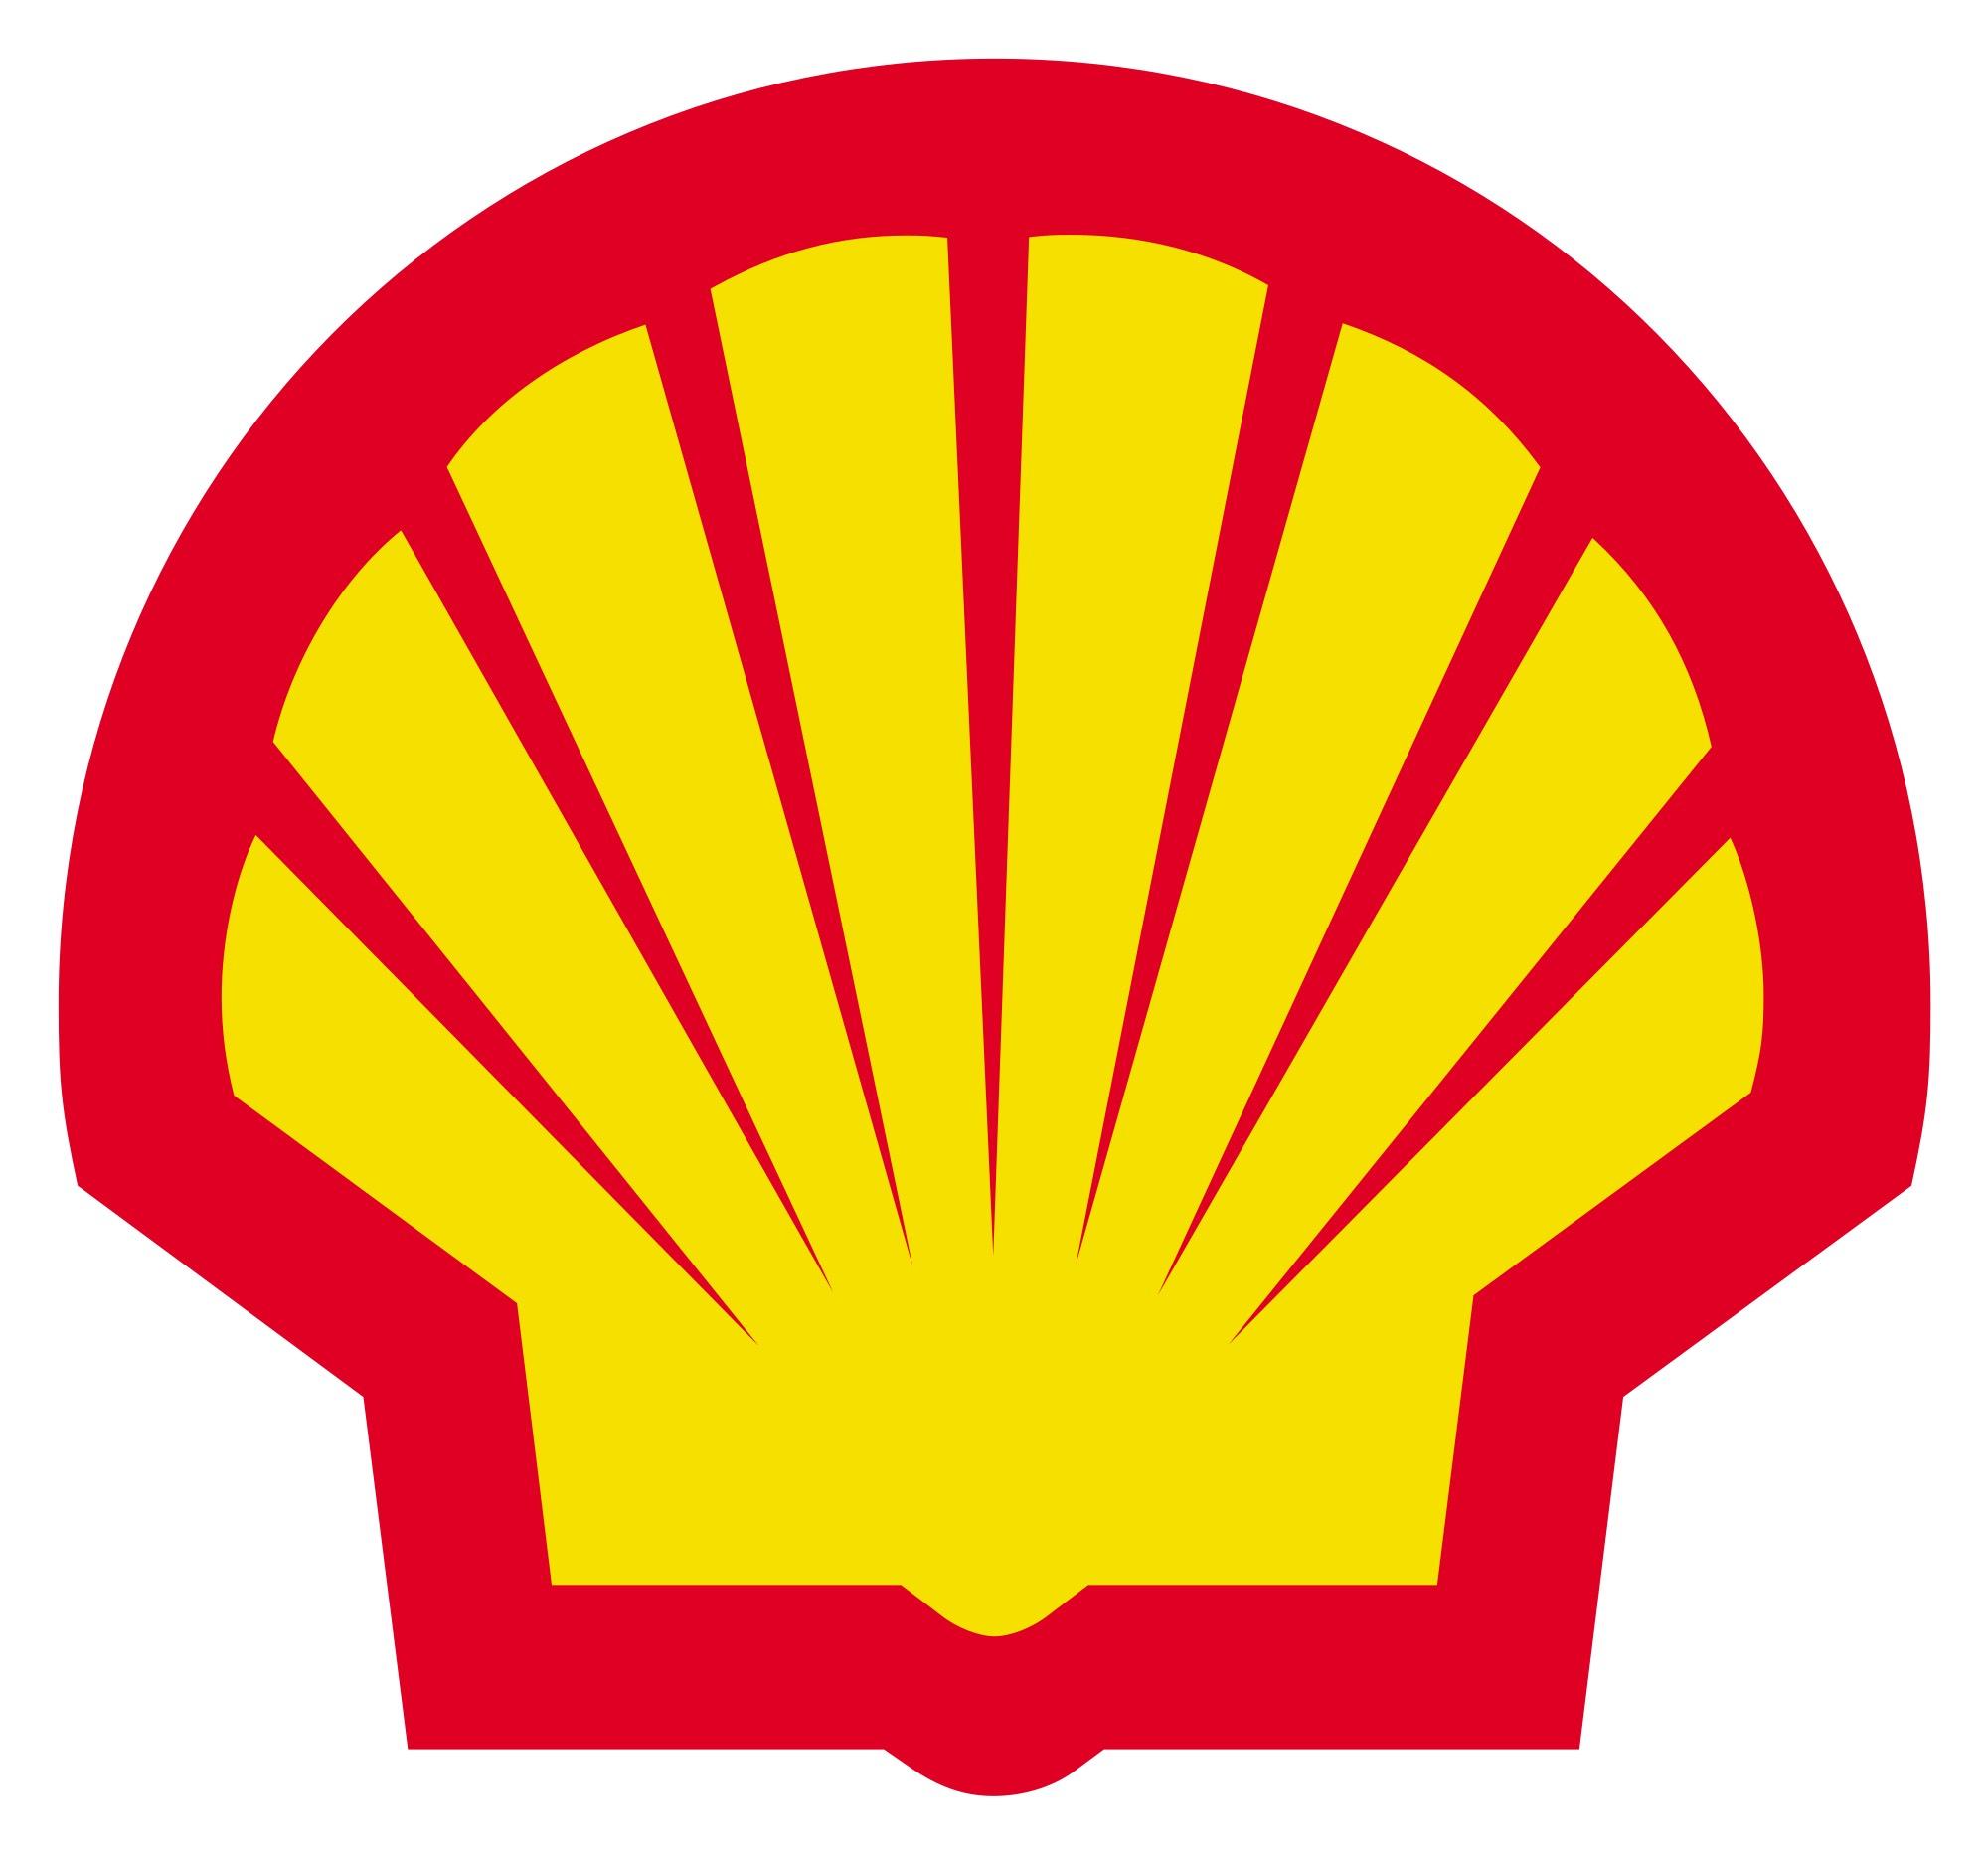 Shell Clubsmart Oster Aktion zB 500 Punkte ab 1l tanken (personalisiert)